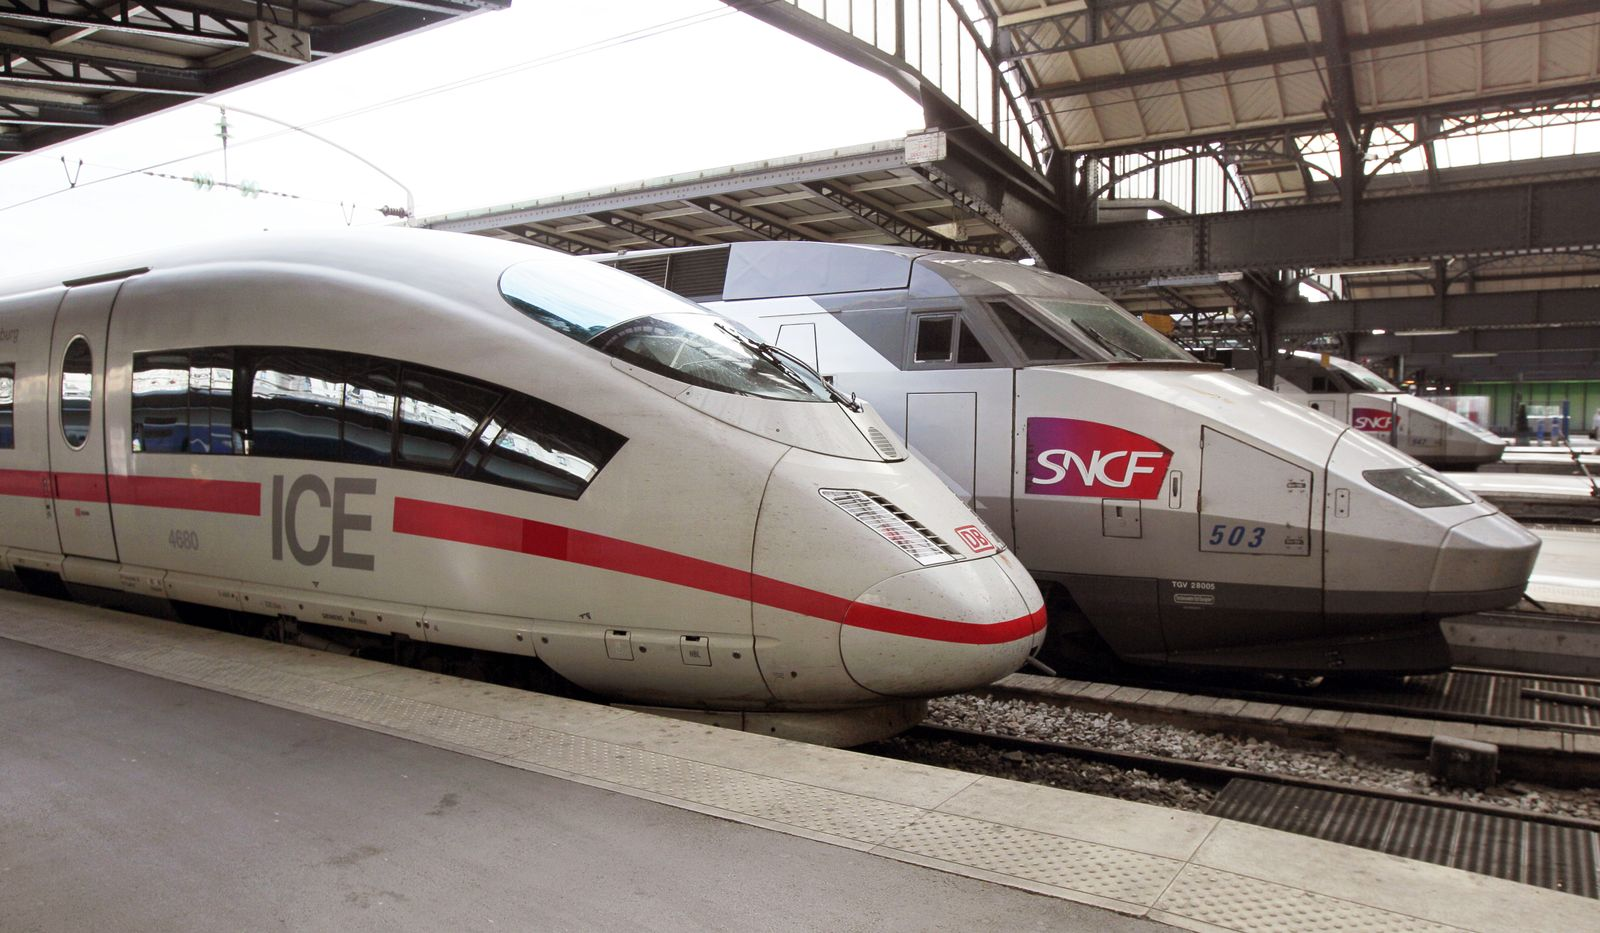 ICE Generation / TGV